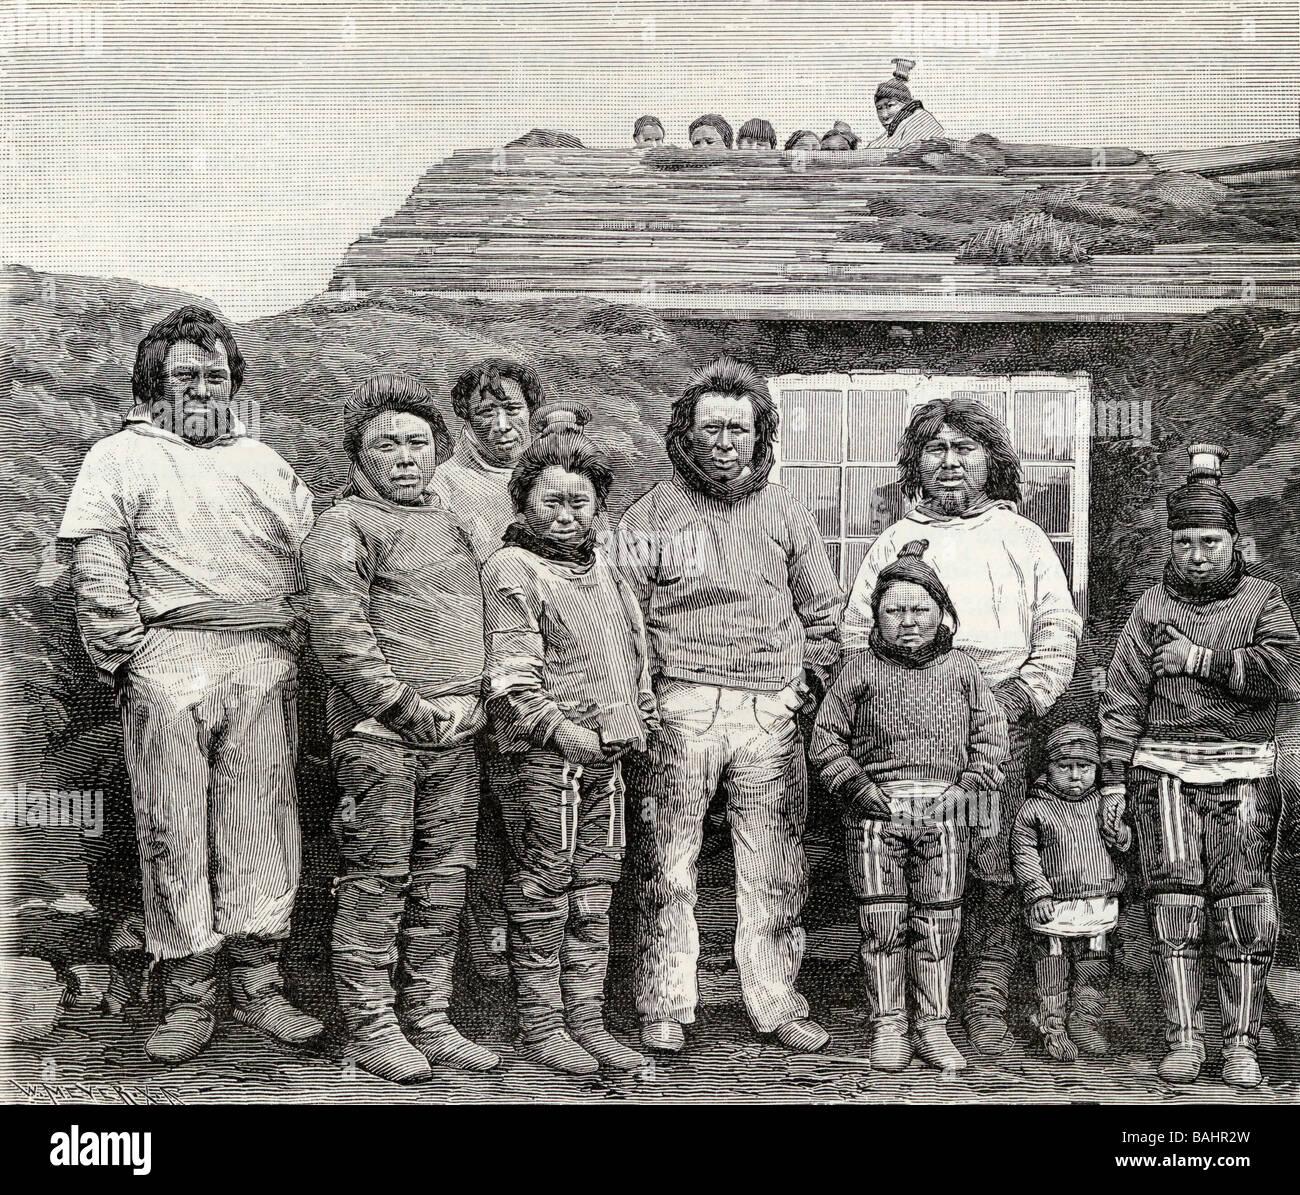 Una familia esquimal grabados a partir de una fotografía del siglo XIX del libro El Inglés Revista Ilustrada Imagen De Stock